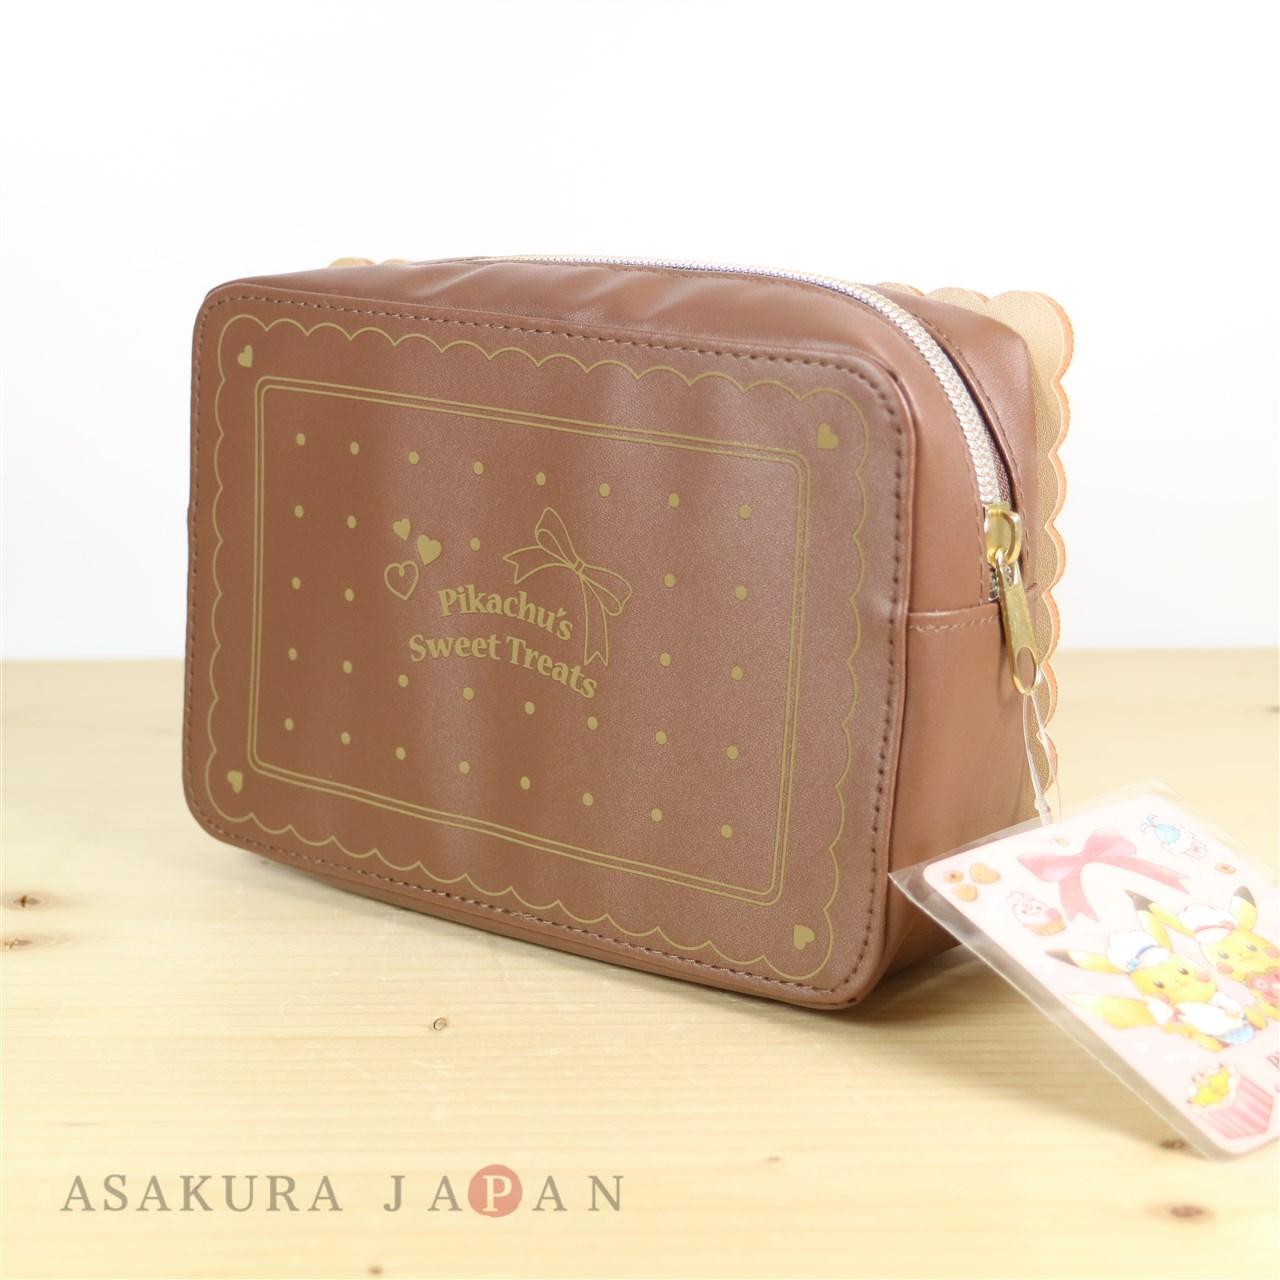 Pokemon Center Original Pikachu/'s Sweet Treats Drawstring Bag pouch From Japan